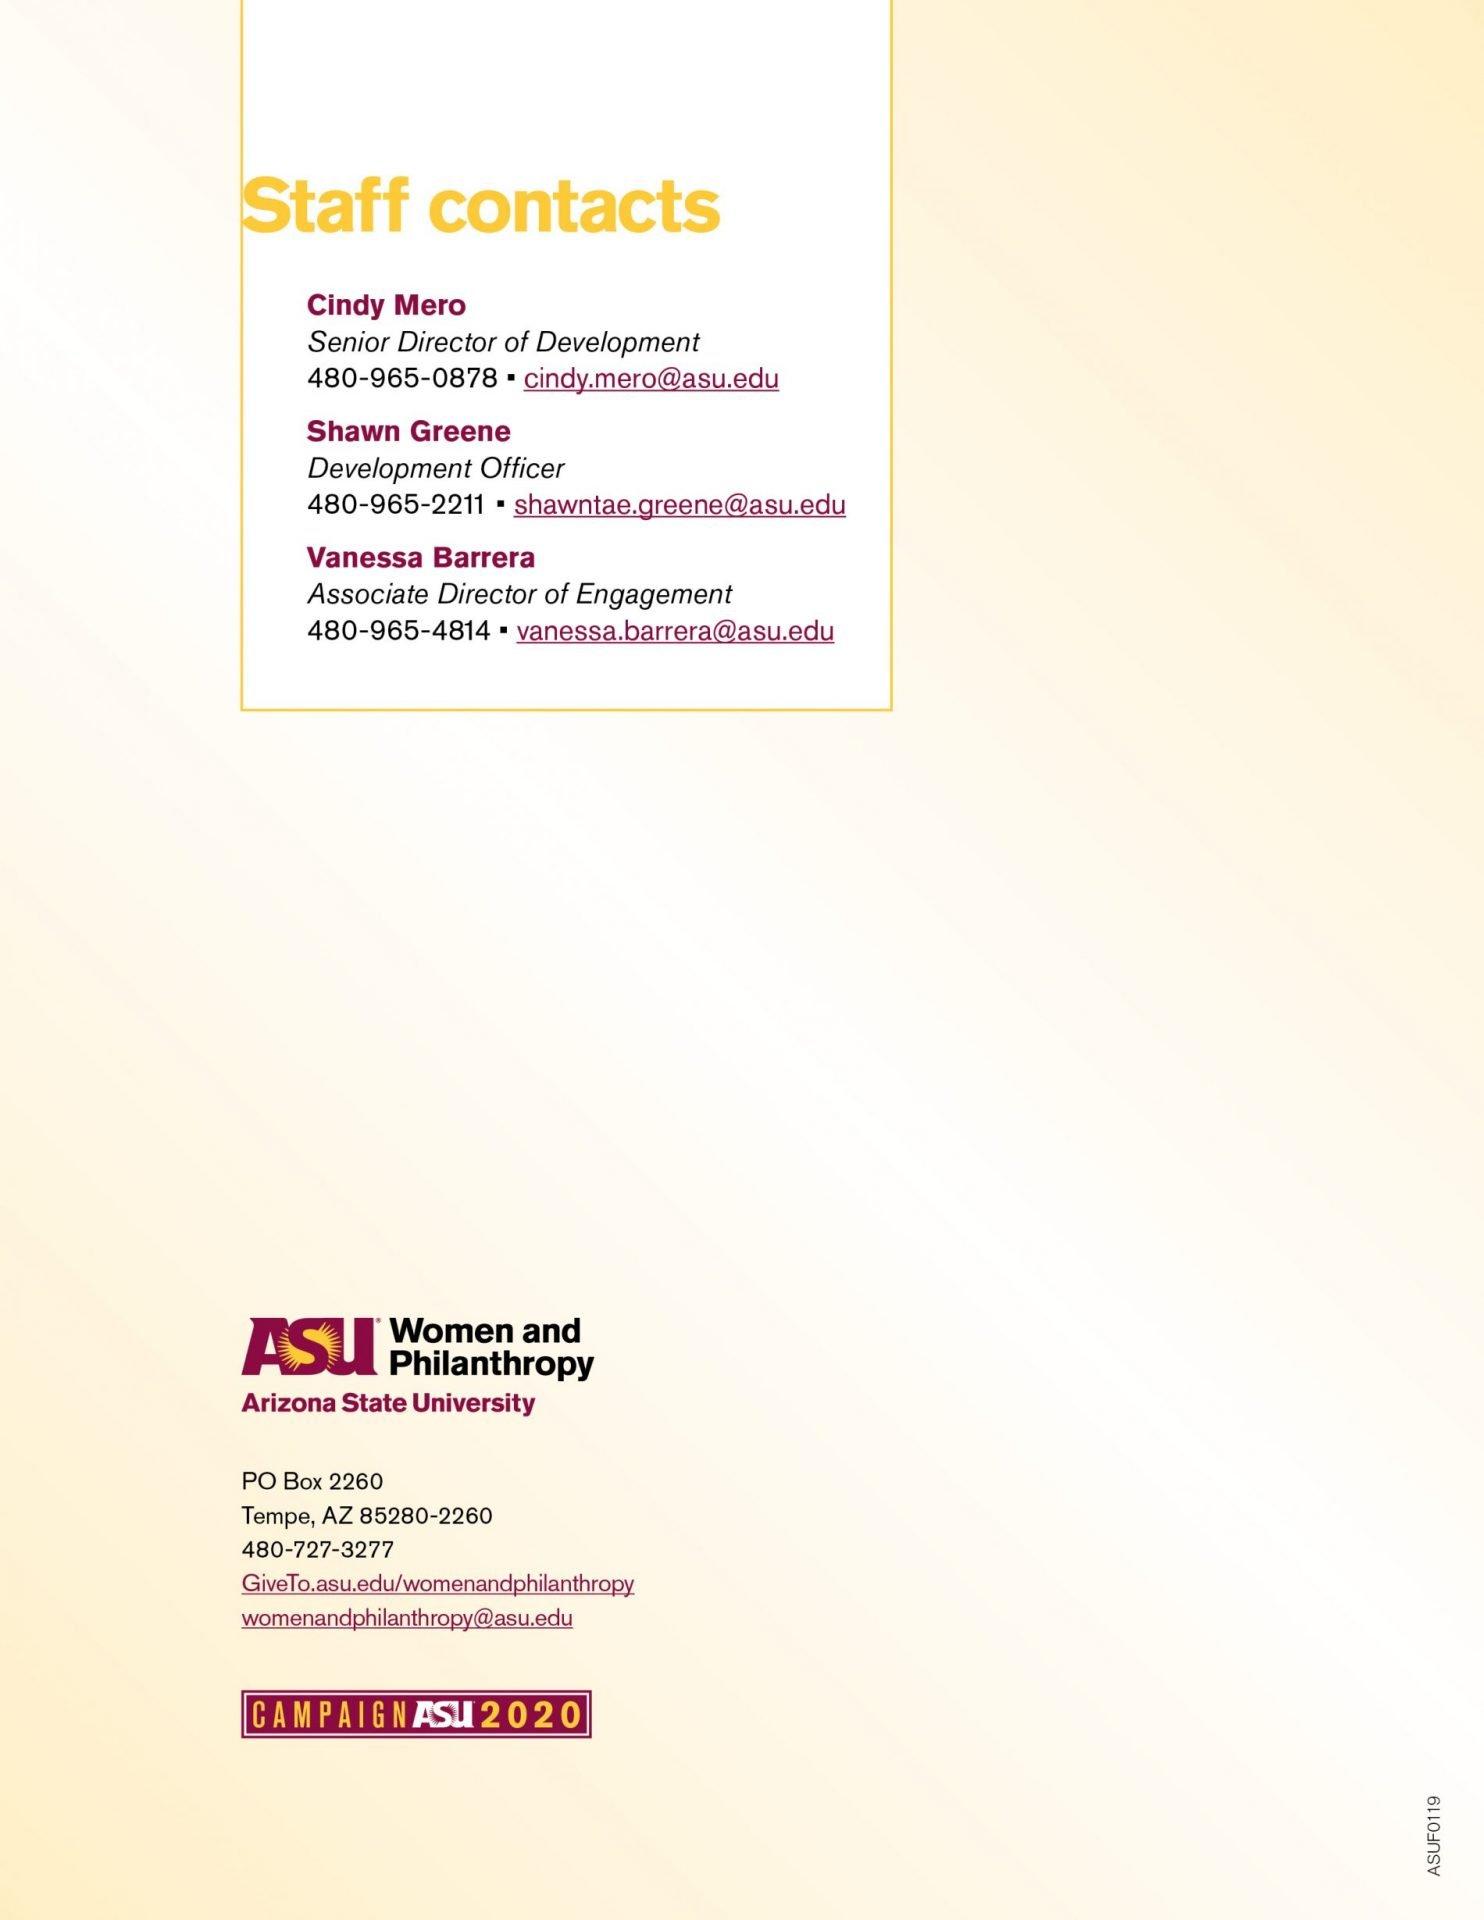 ASU-Women-Philanthropy-grant-funding-booklet_08